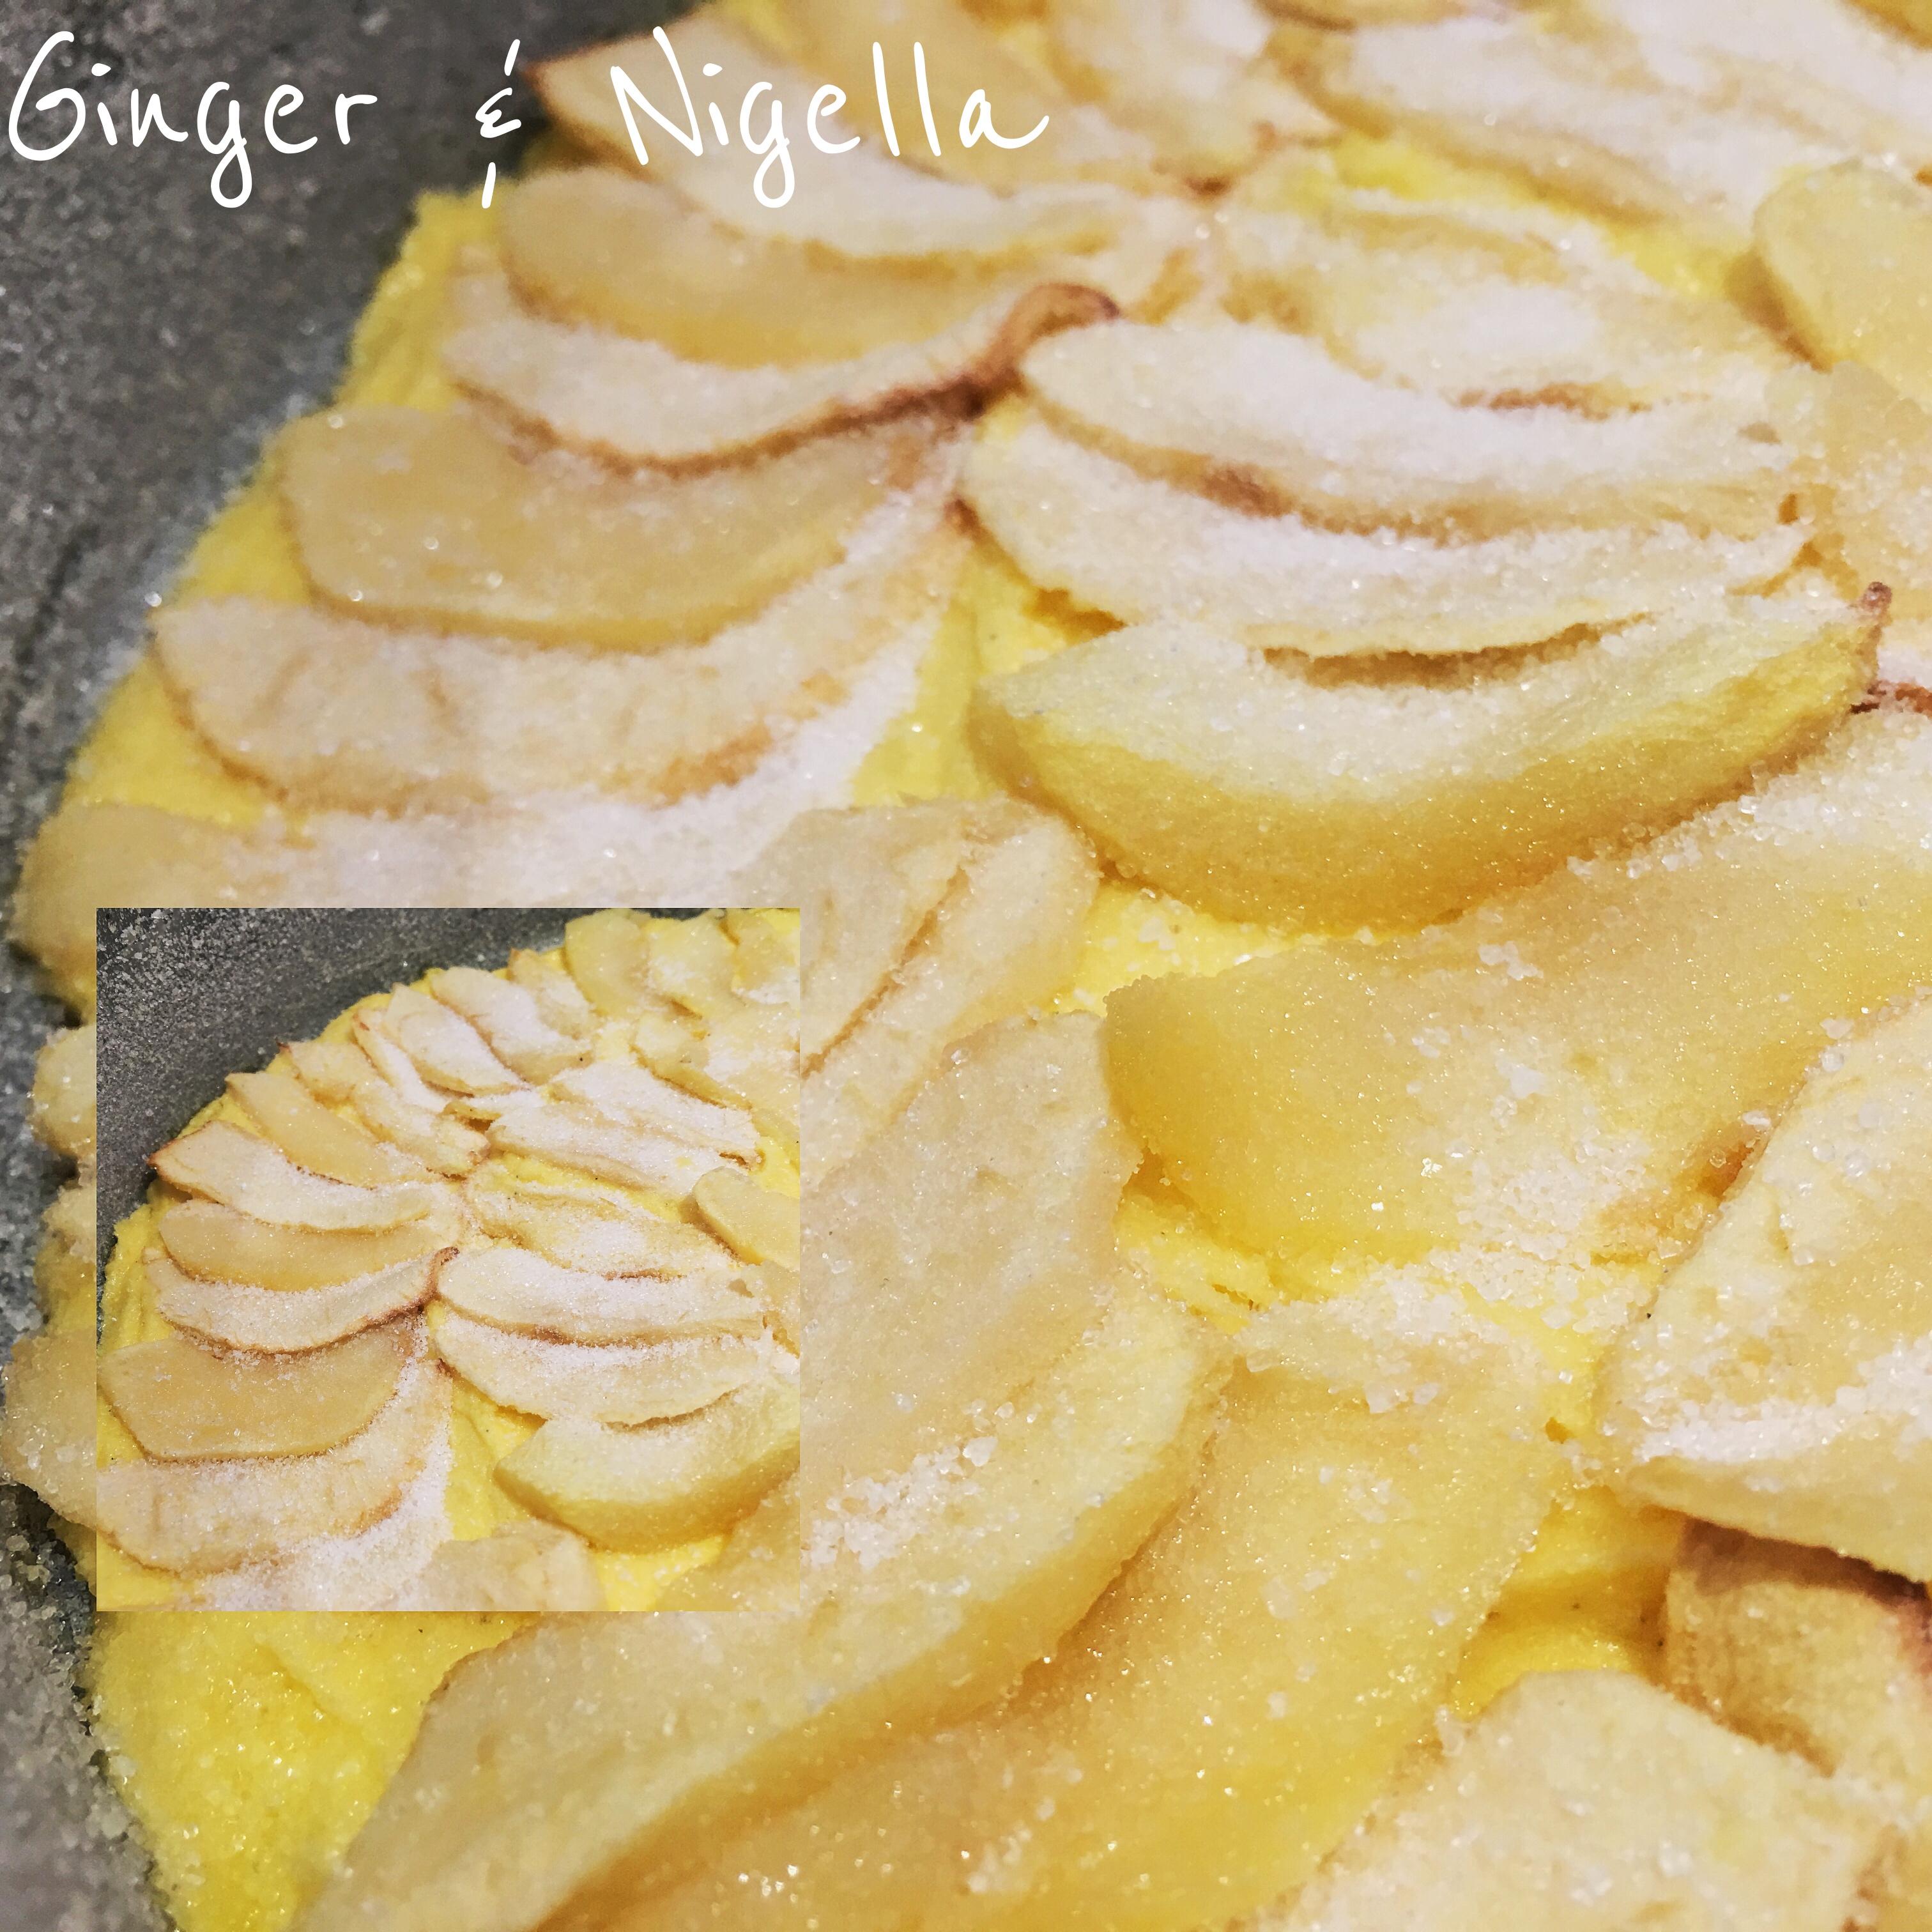 montersino, mele, torta di mele, torta alla frutta, Gino Fabbri, torta ...